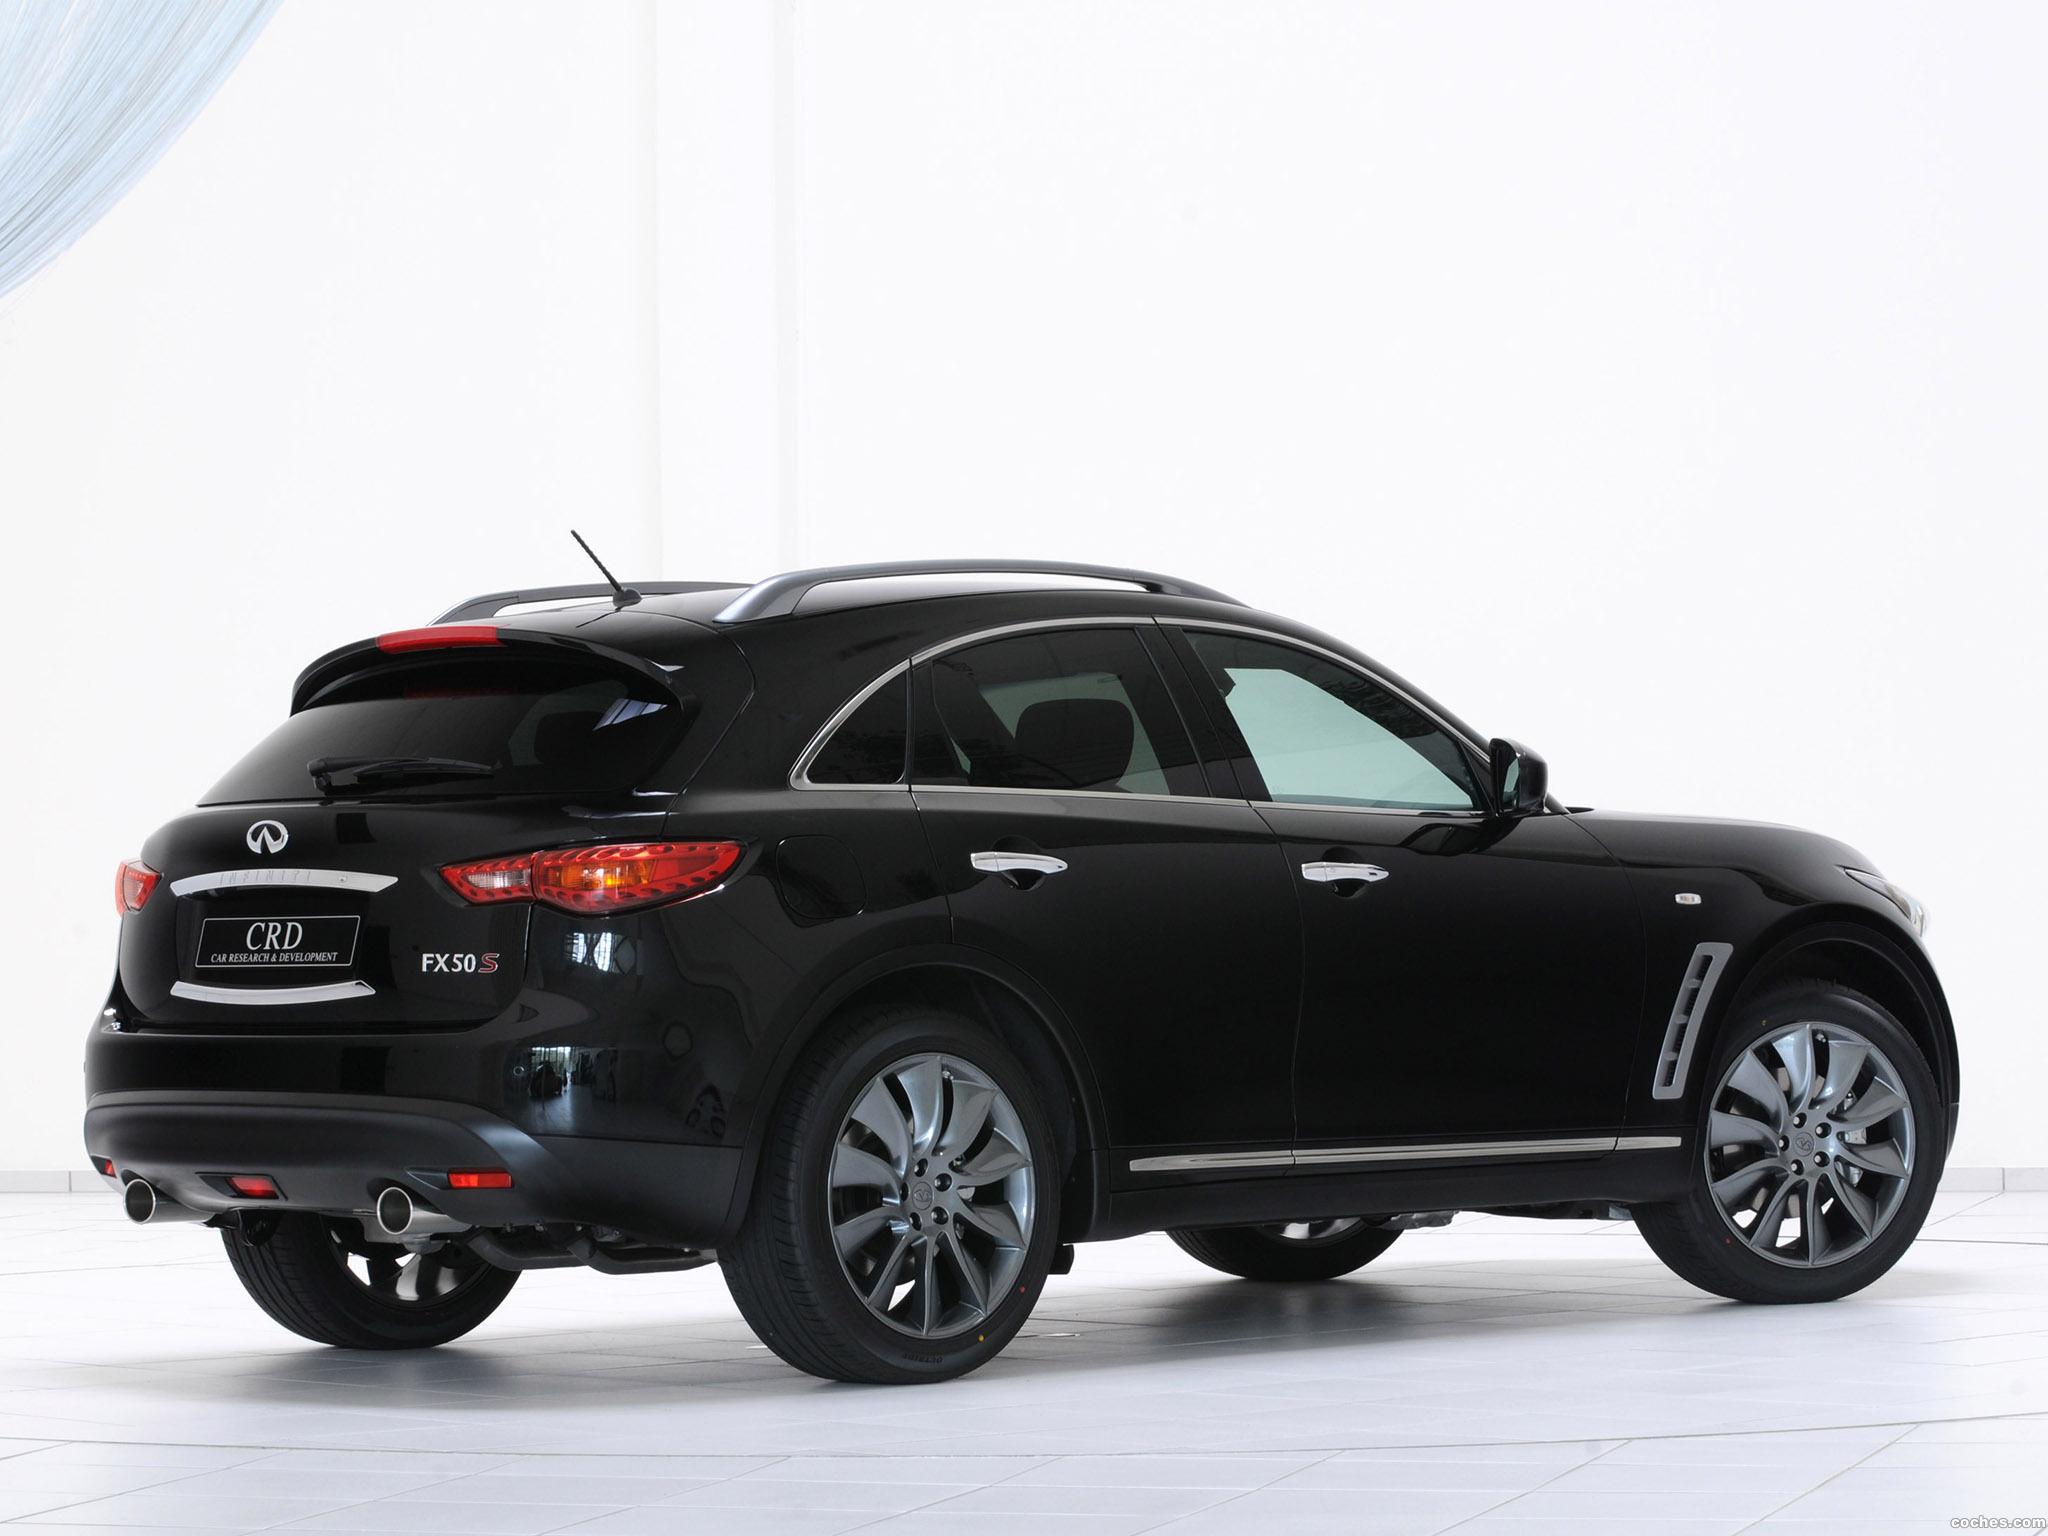 Foto 1 de Infiniti FX 50S Concept Car by CRD 2009